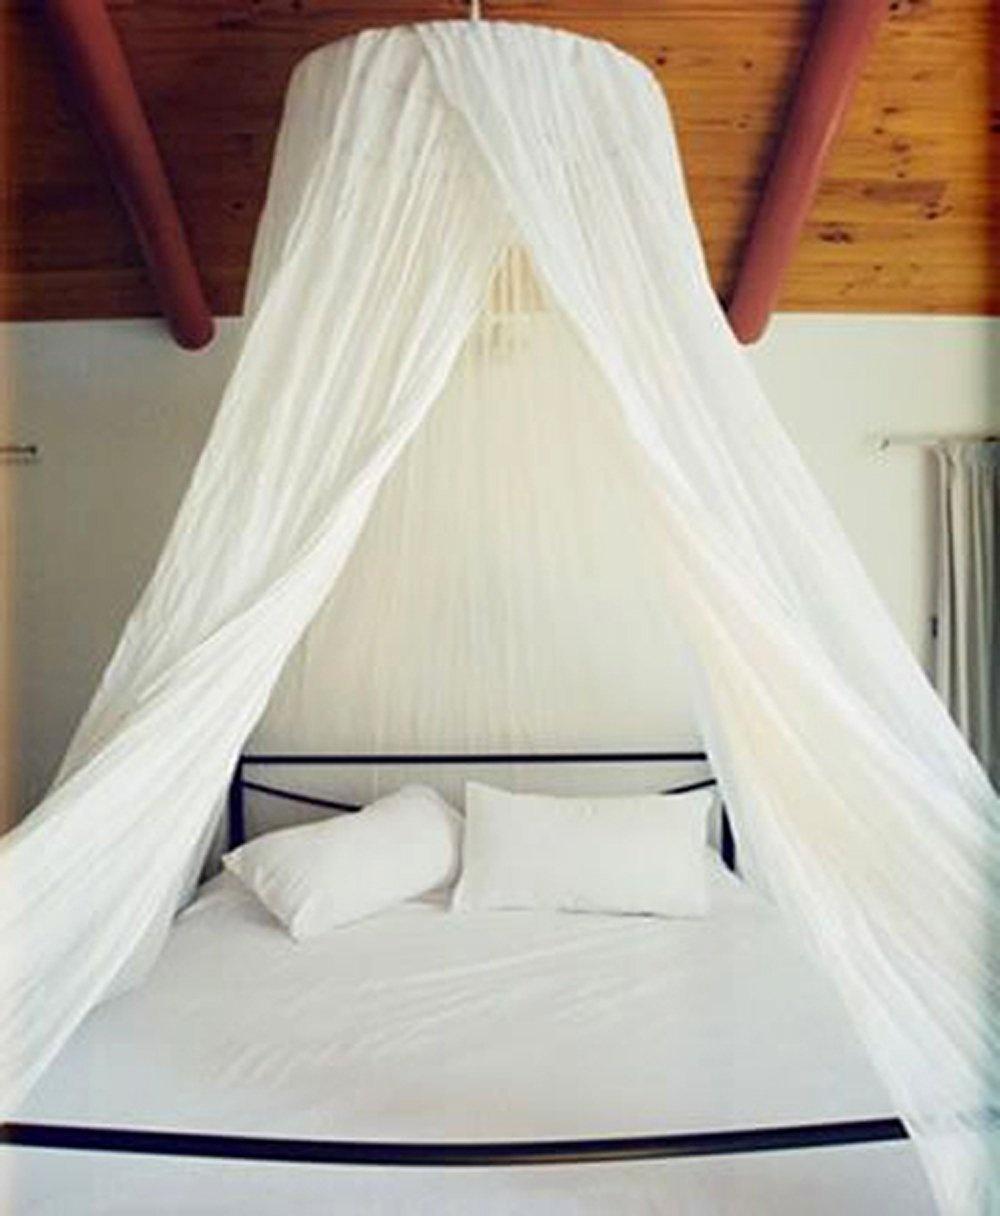 Dreamma Eletgant White Round Bed Canopy Mosquito Net